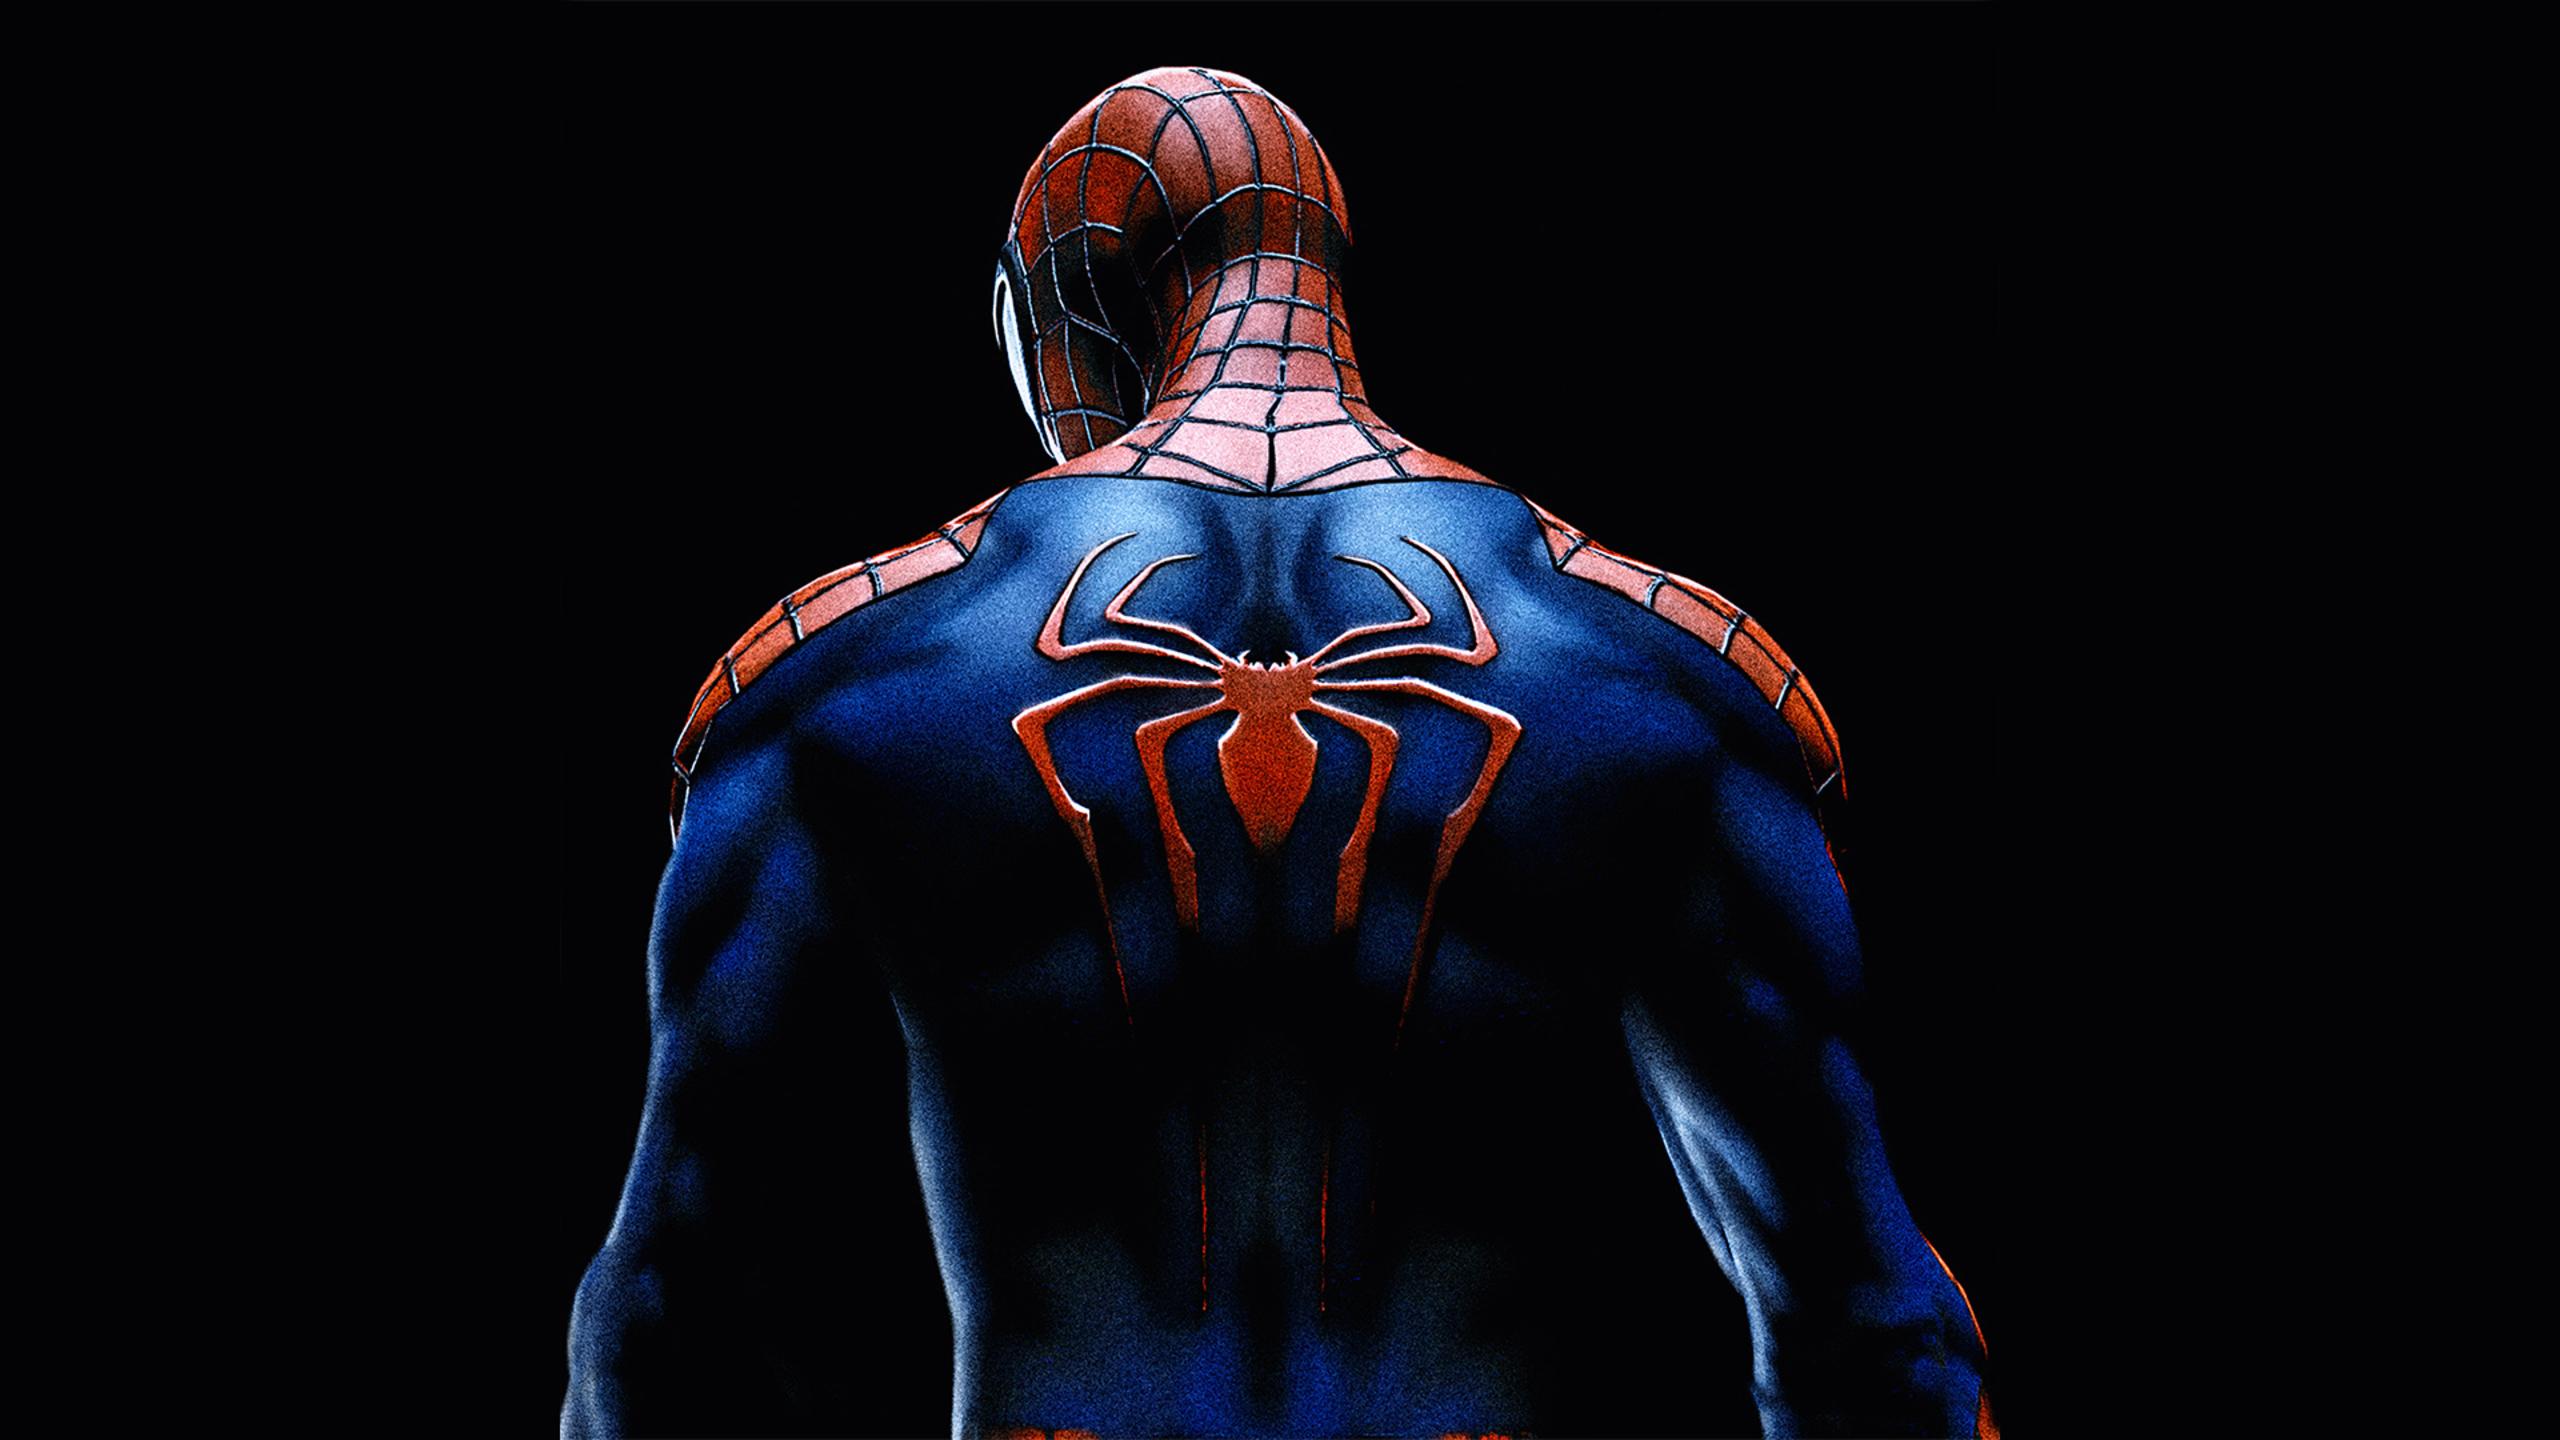 2560x1440 Spiderman Back Spider Logo 1440P Resolution HD ...